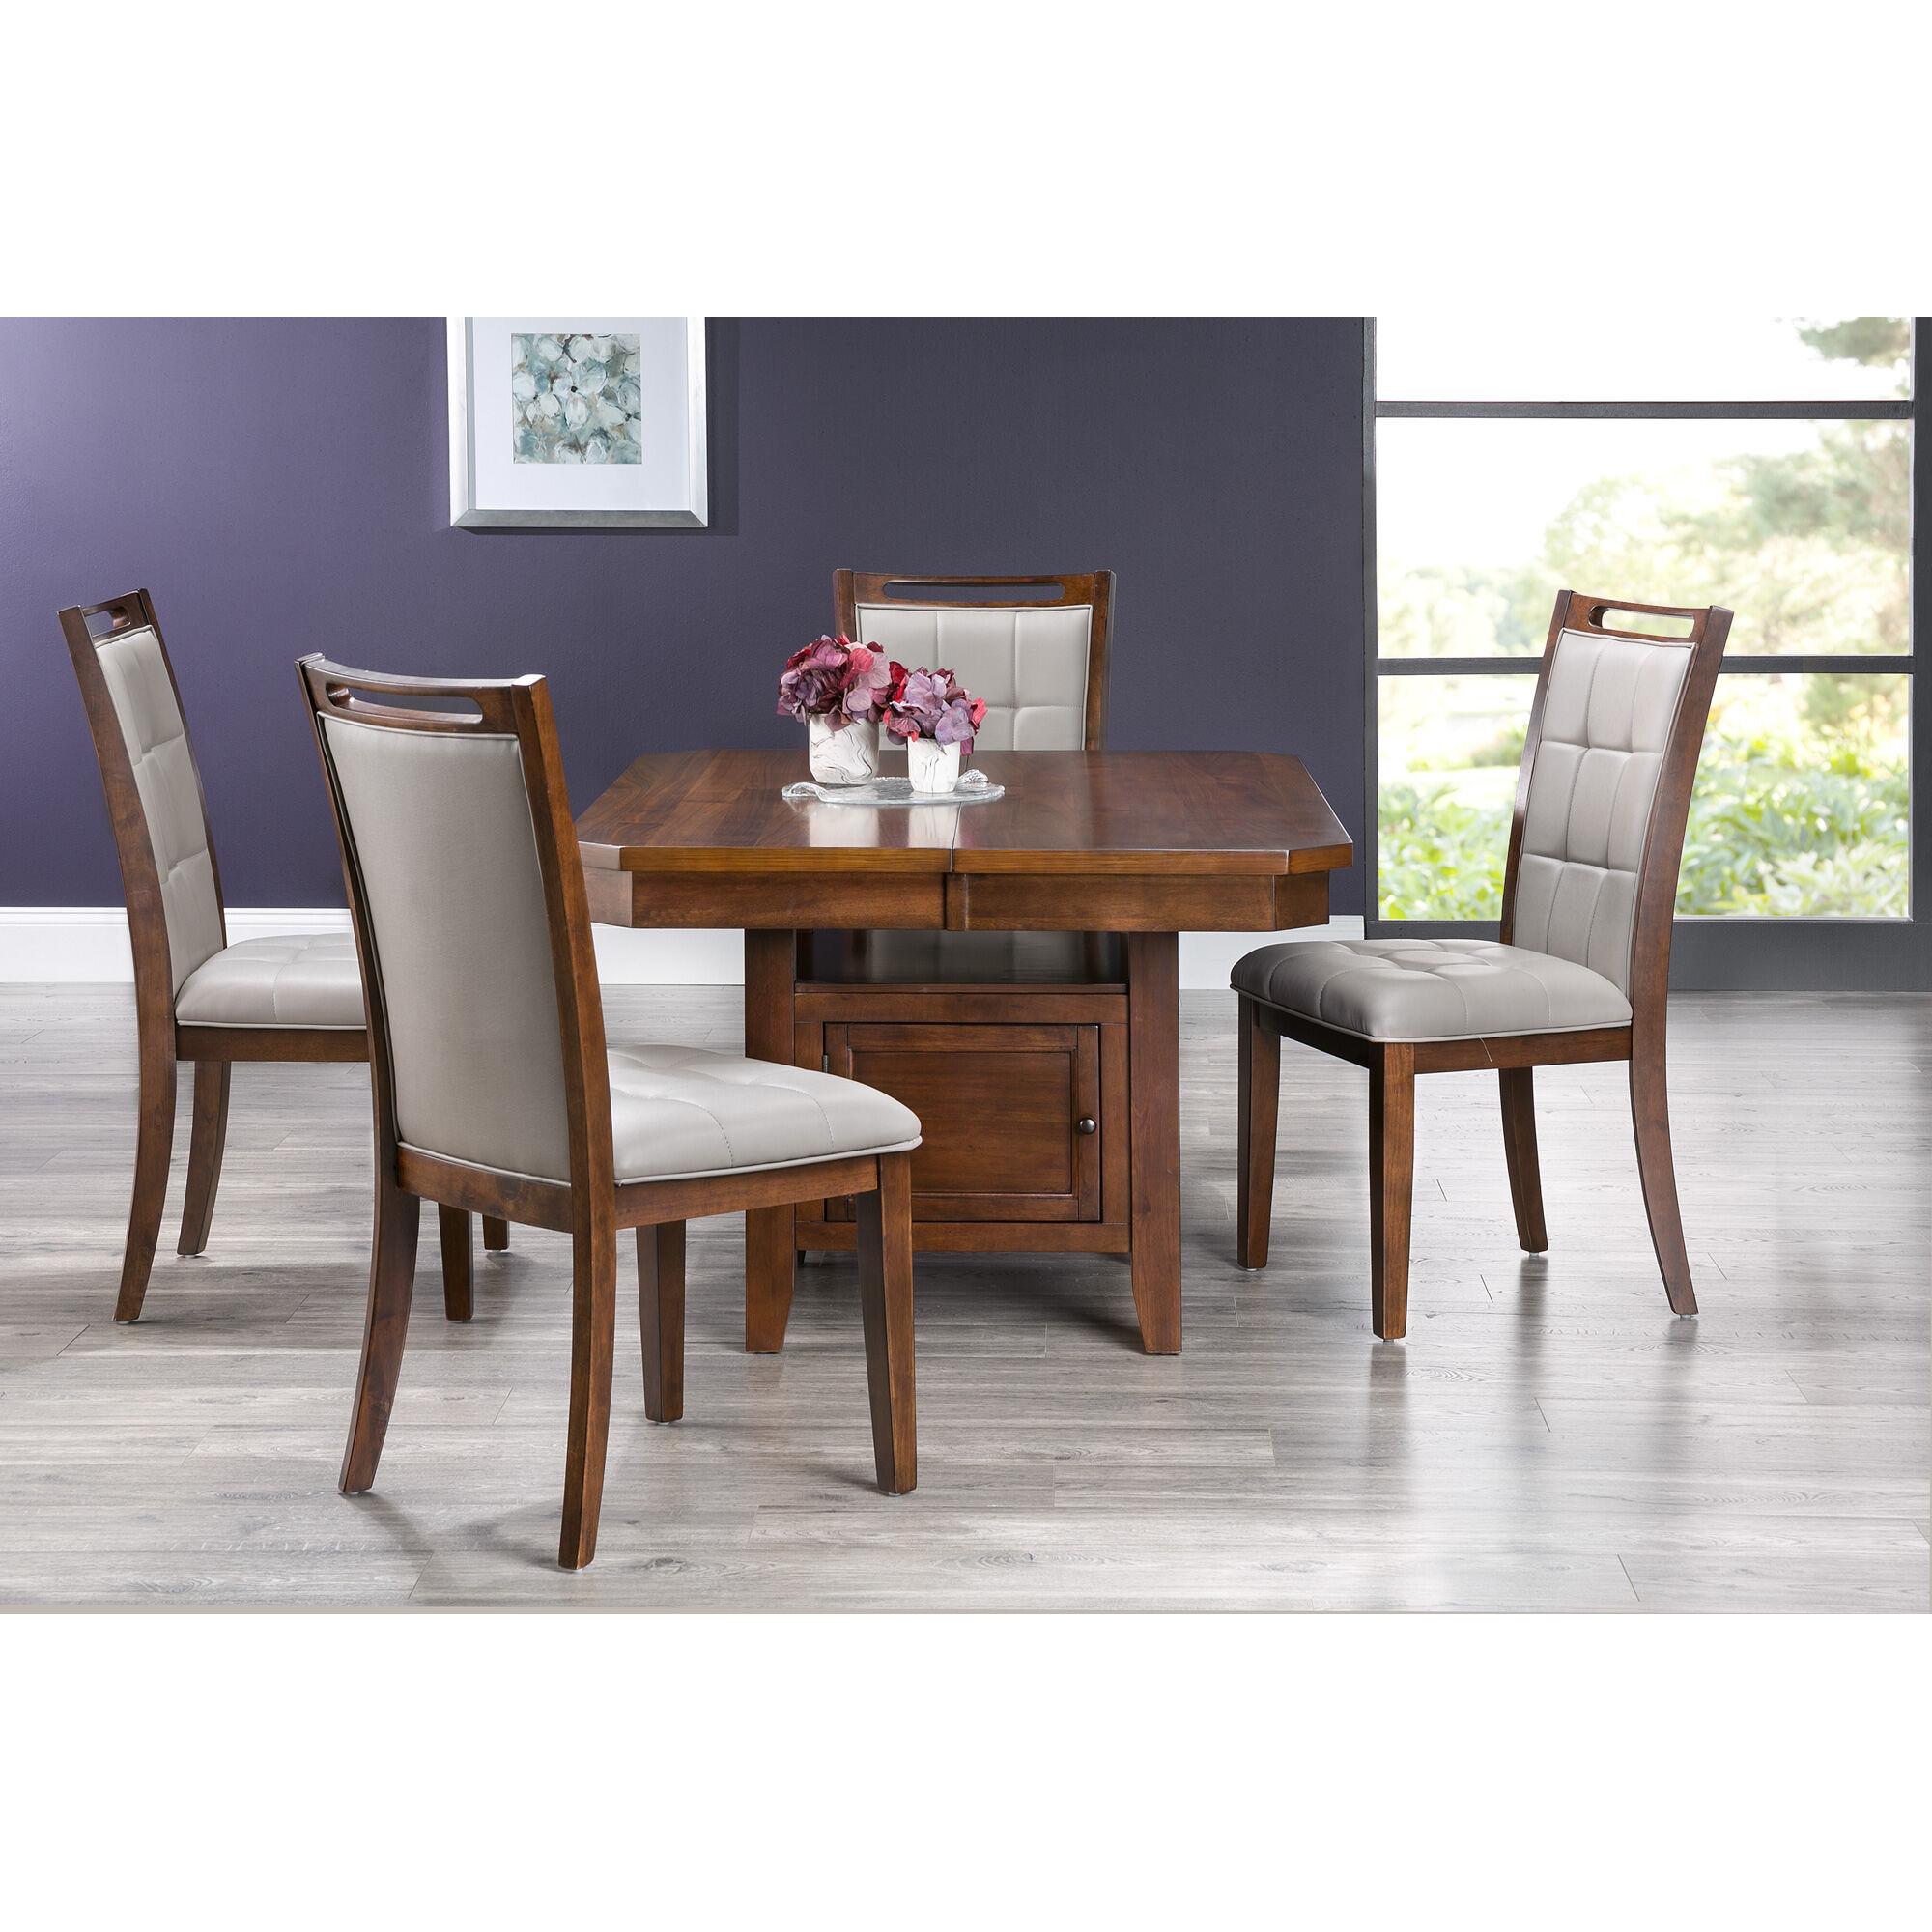 slumberland com sofas living divani sofa furniture   manchester 5pc merlot dining set